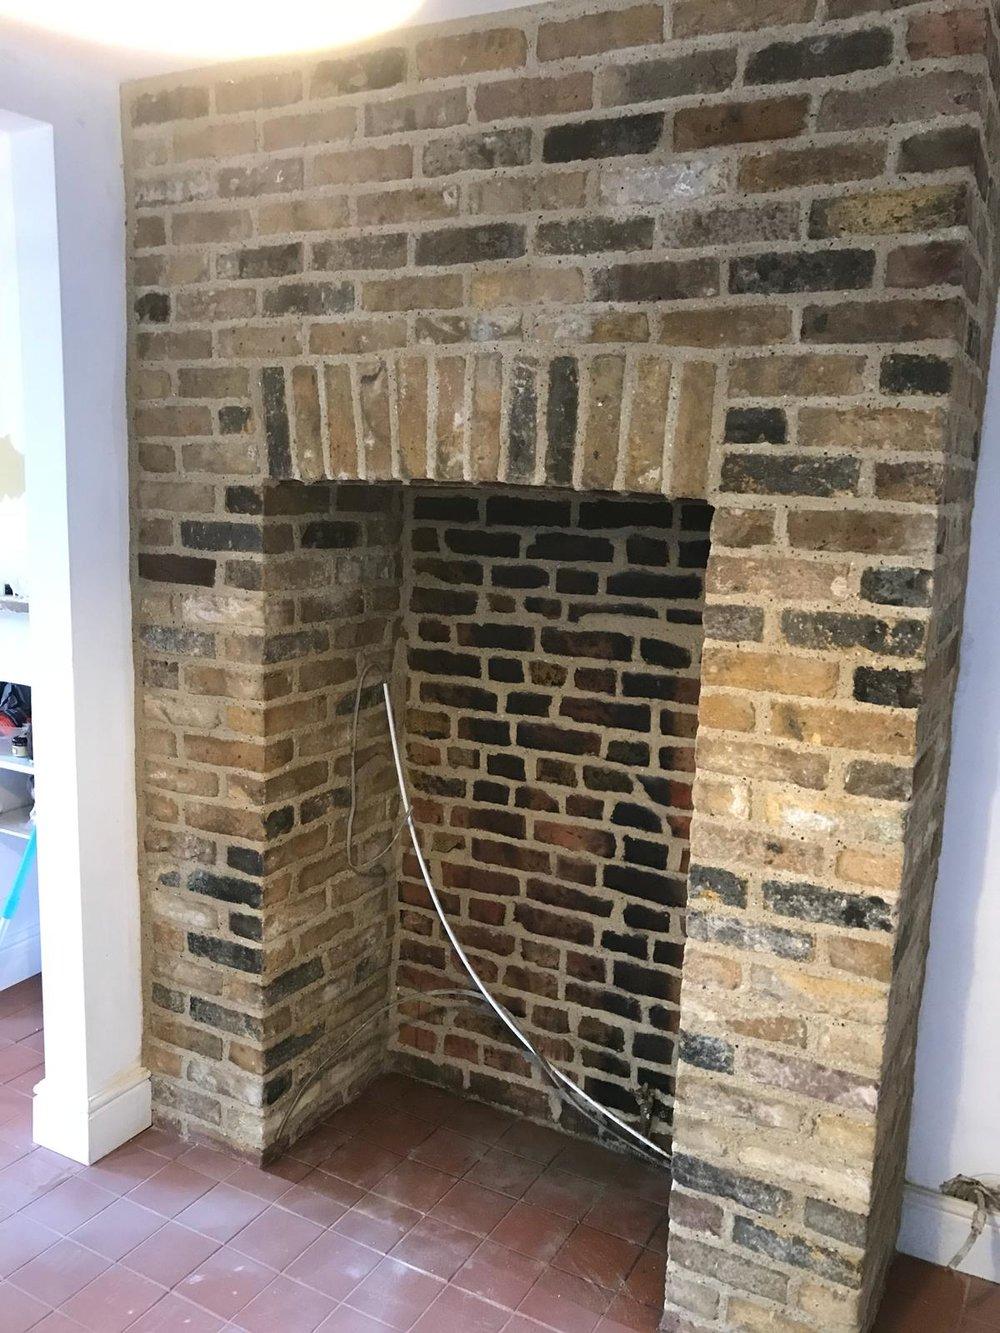 Brick Restoration Project 7 - After